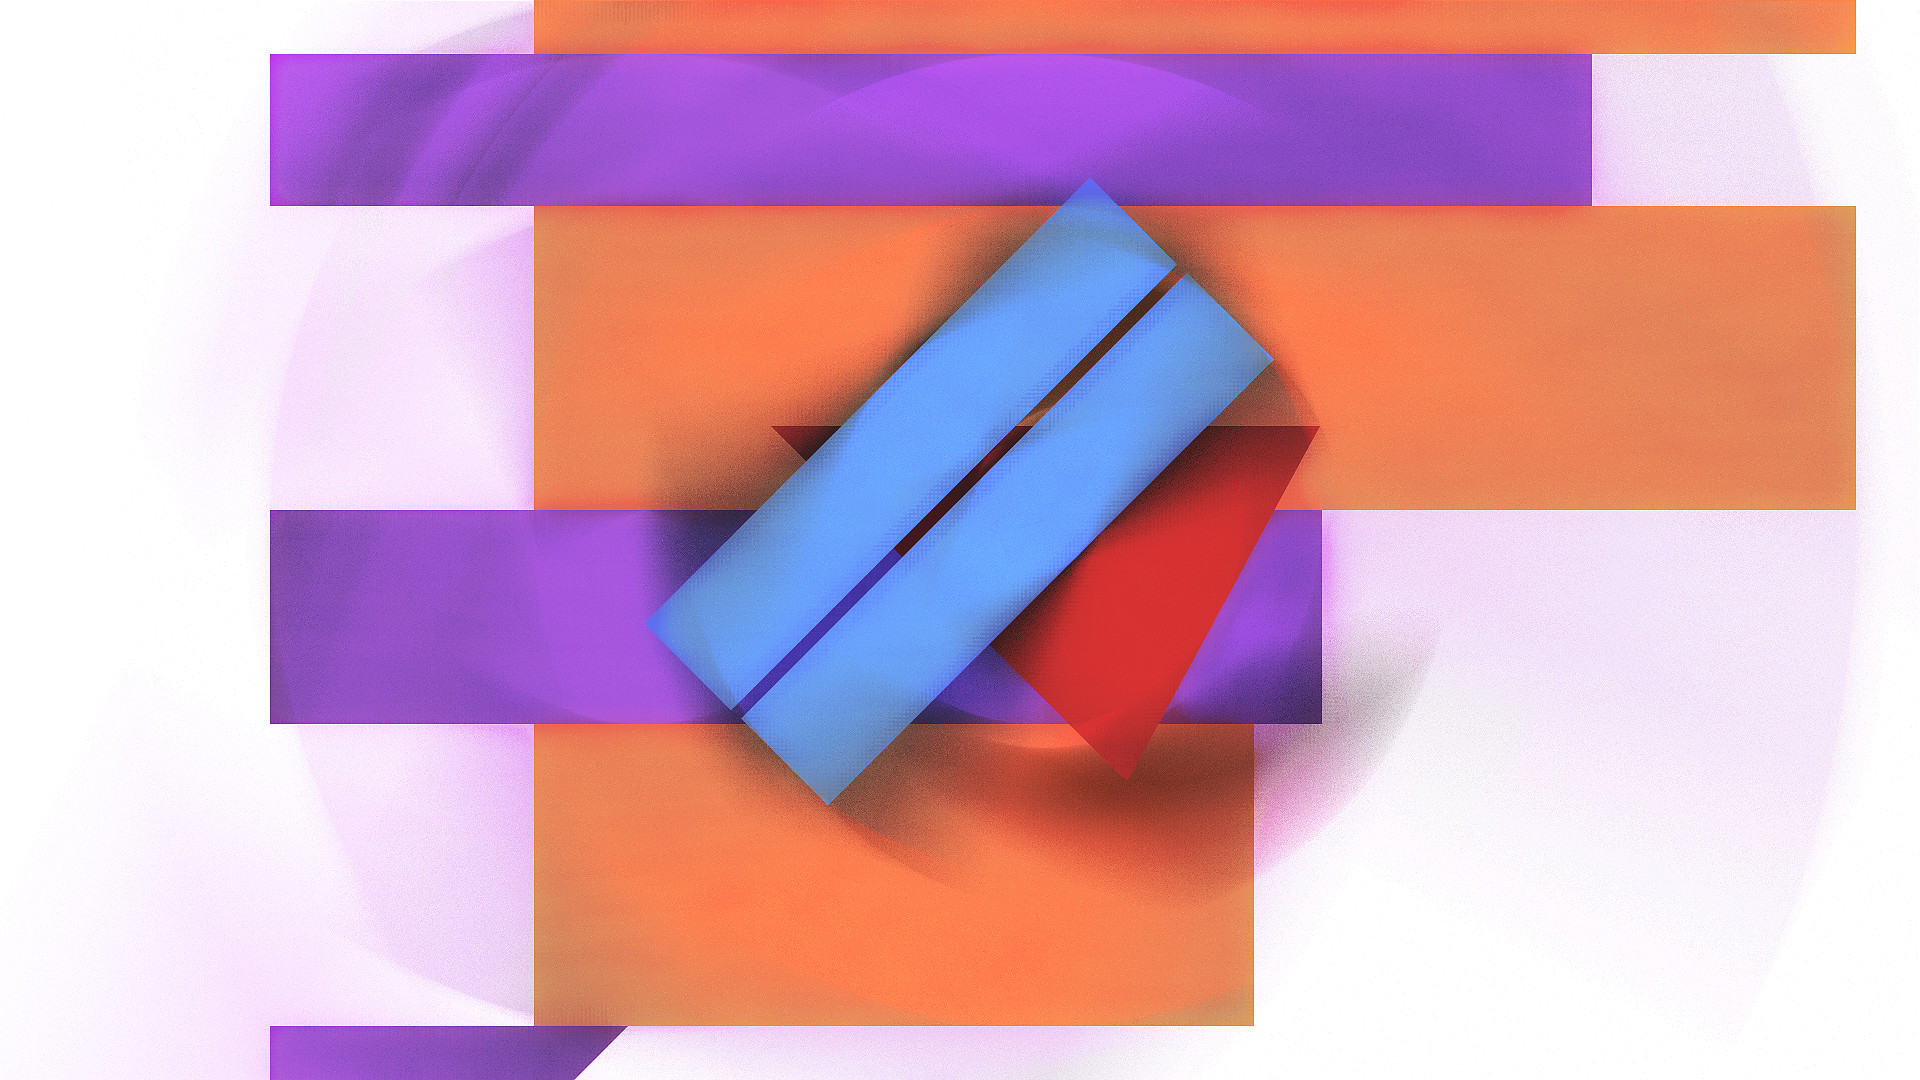 shapes, Geometry, Minimalism, Simple Wallpaper HD